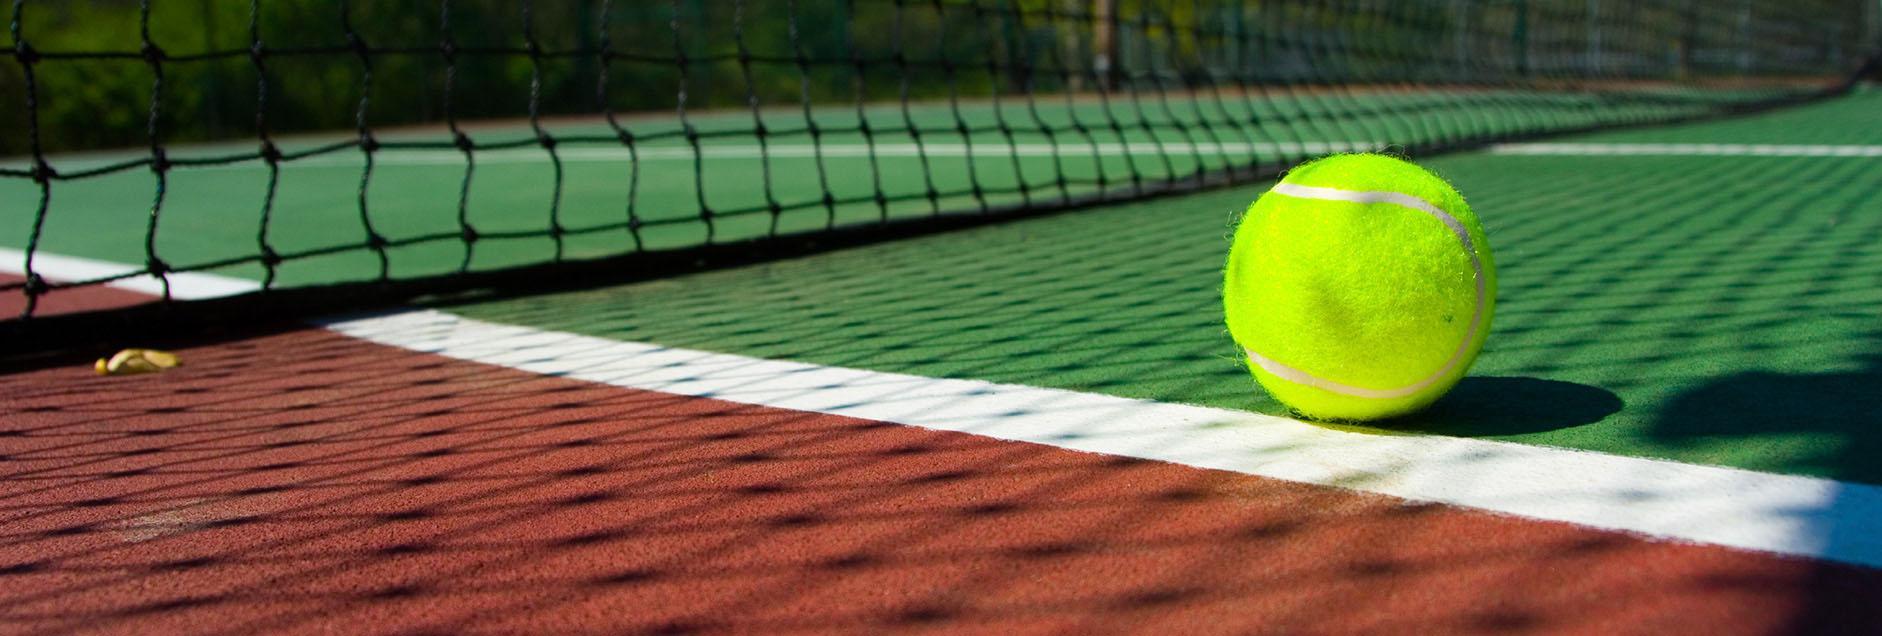 Gratis Tennisspielen in BREMEN